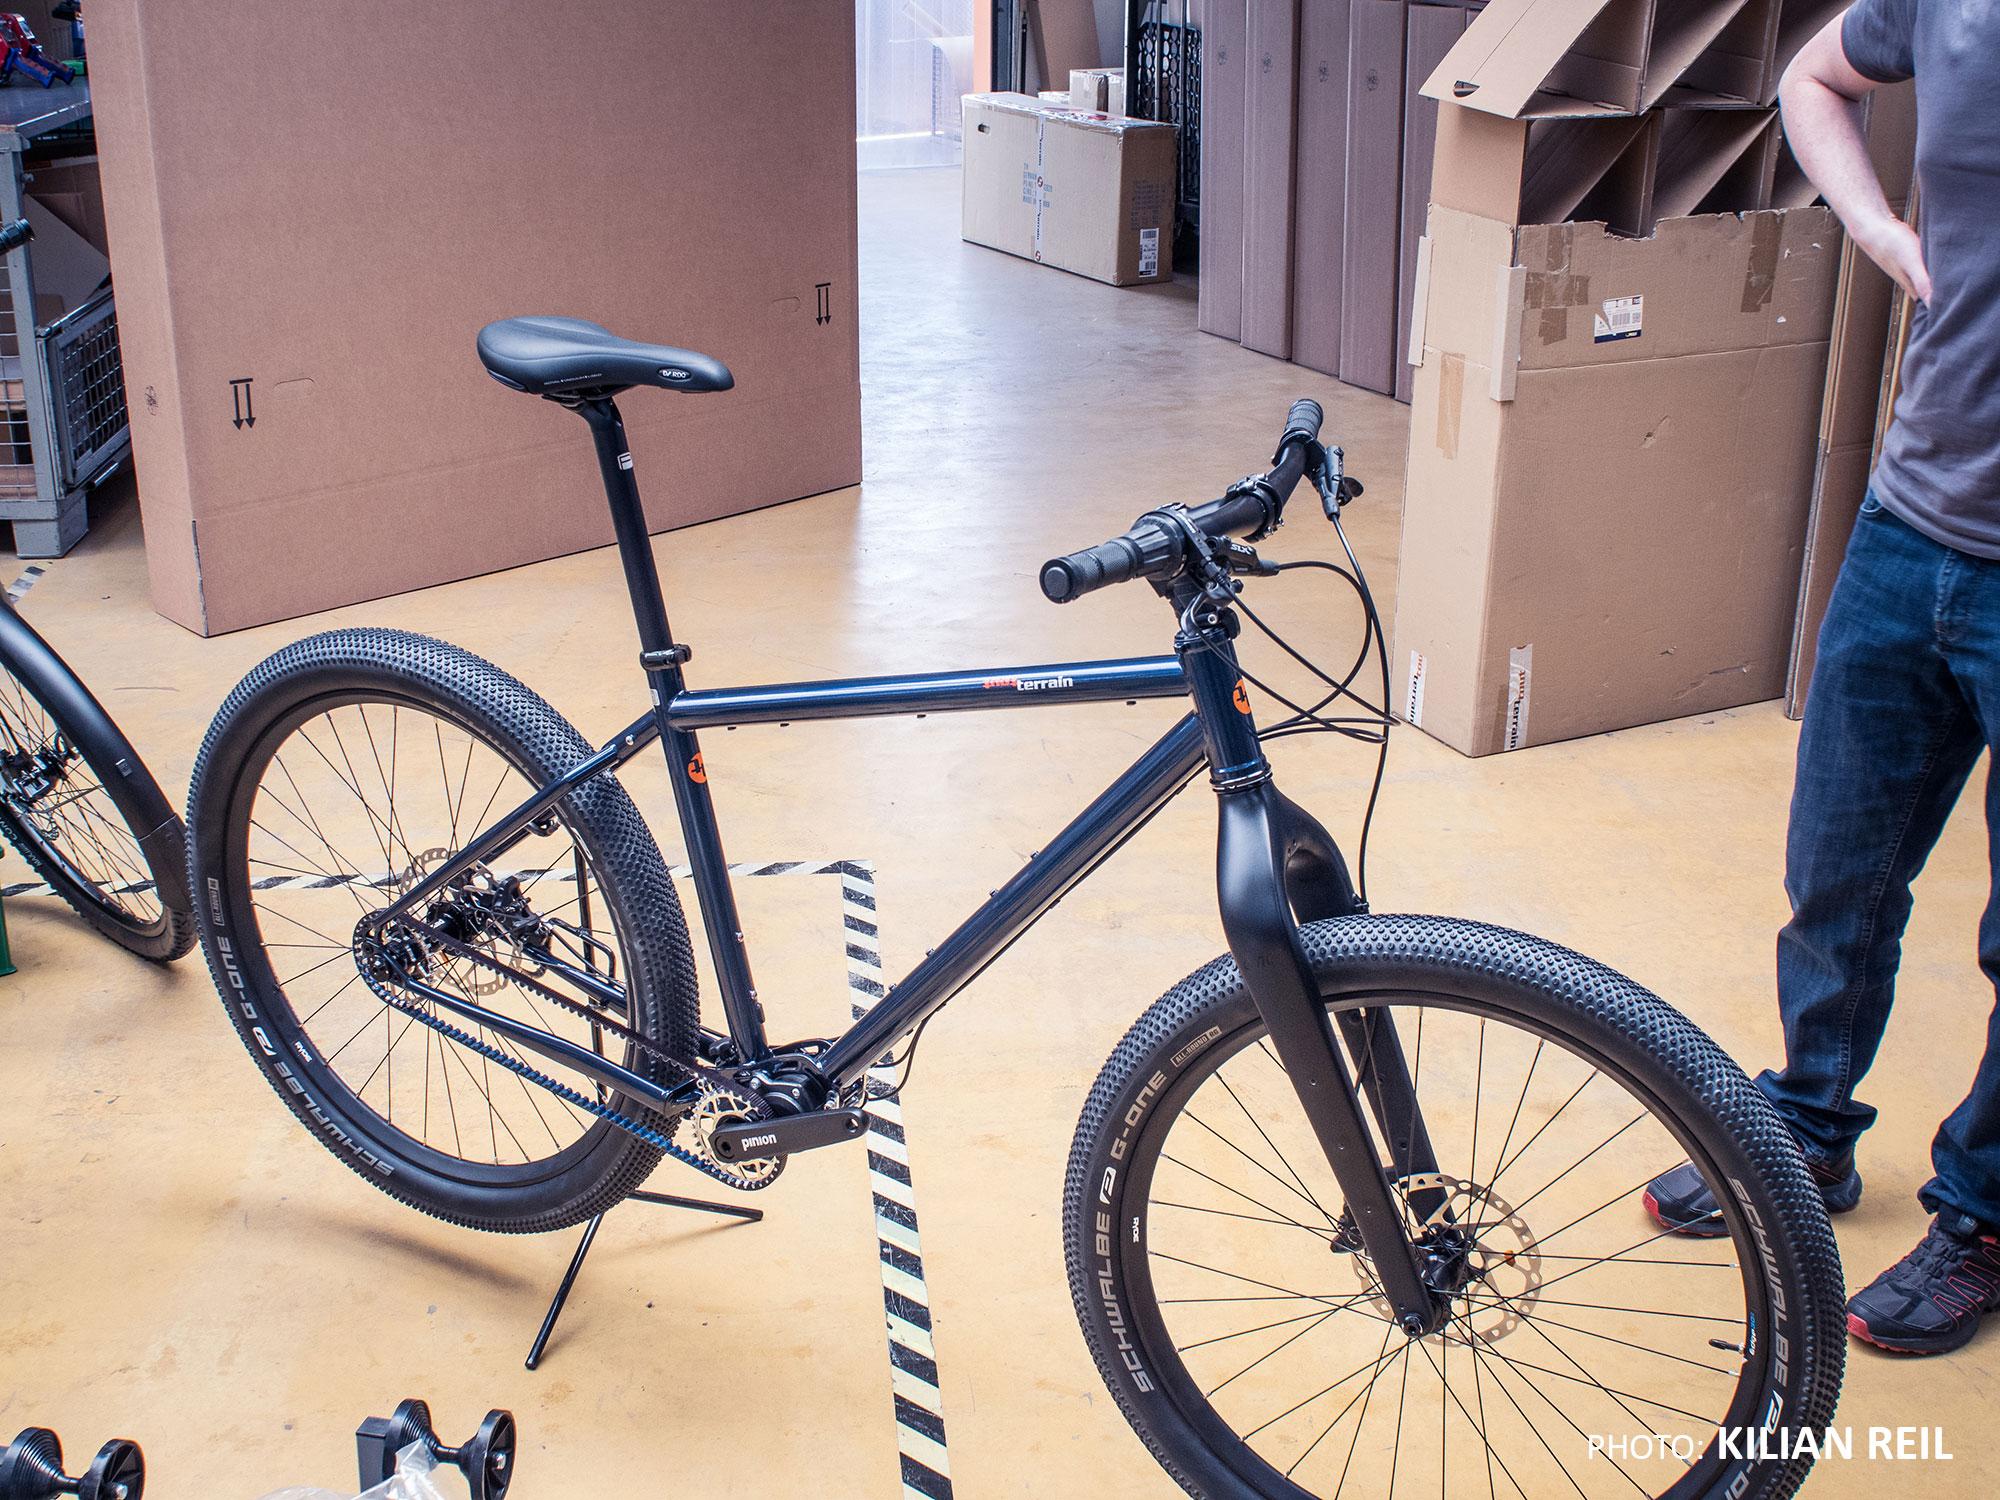 Bikerafting Jakutien Kilian Reil: Tout-Terrain Outback Bike